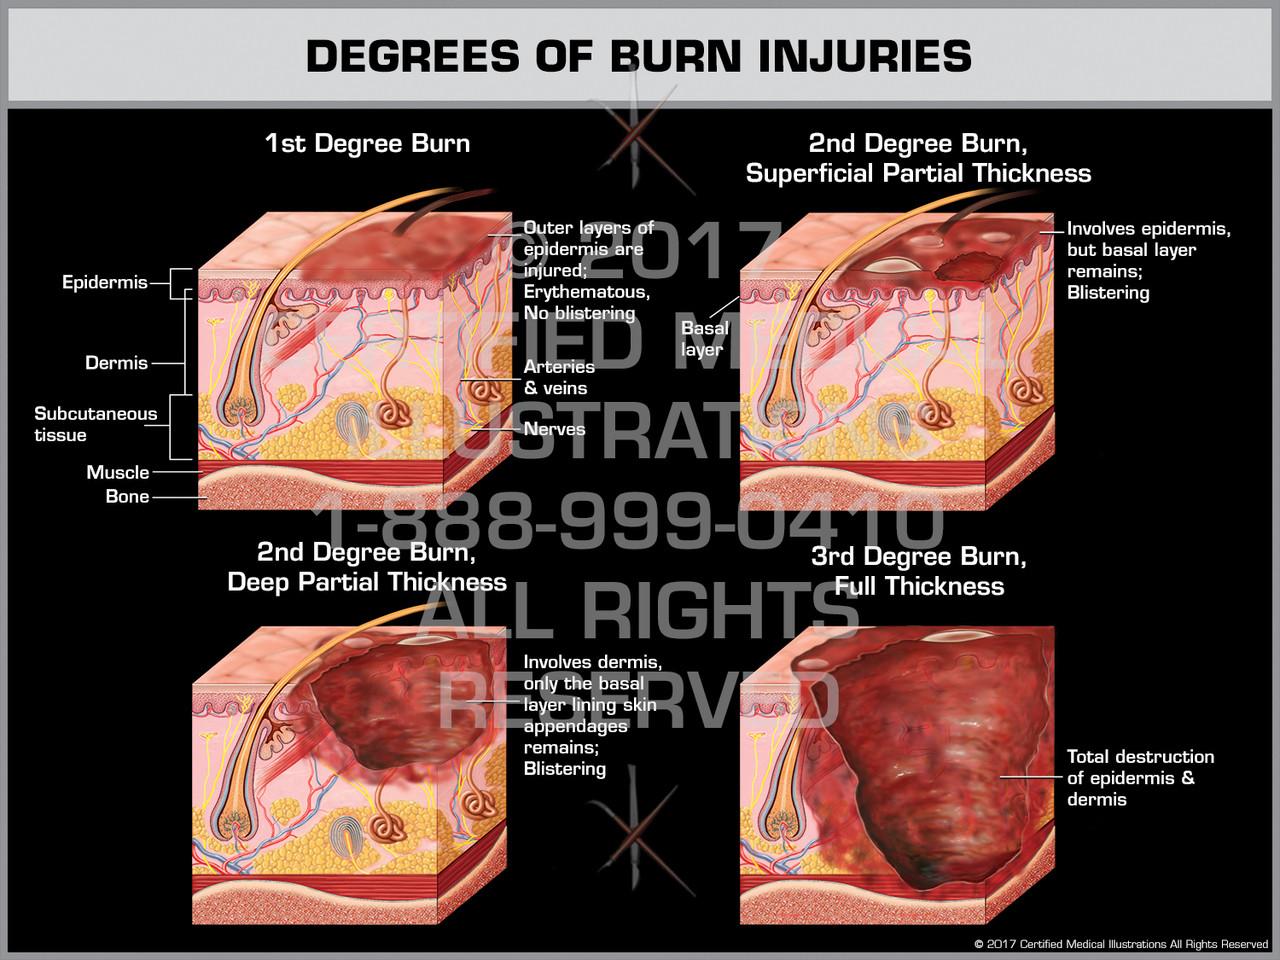 Degrees of Burn Injuries